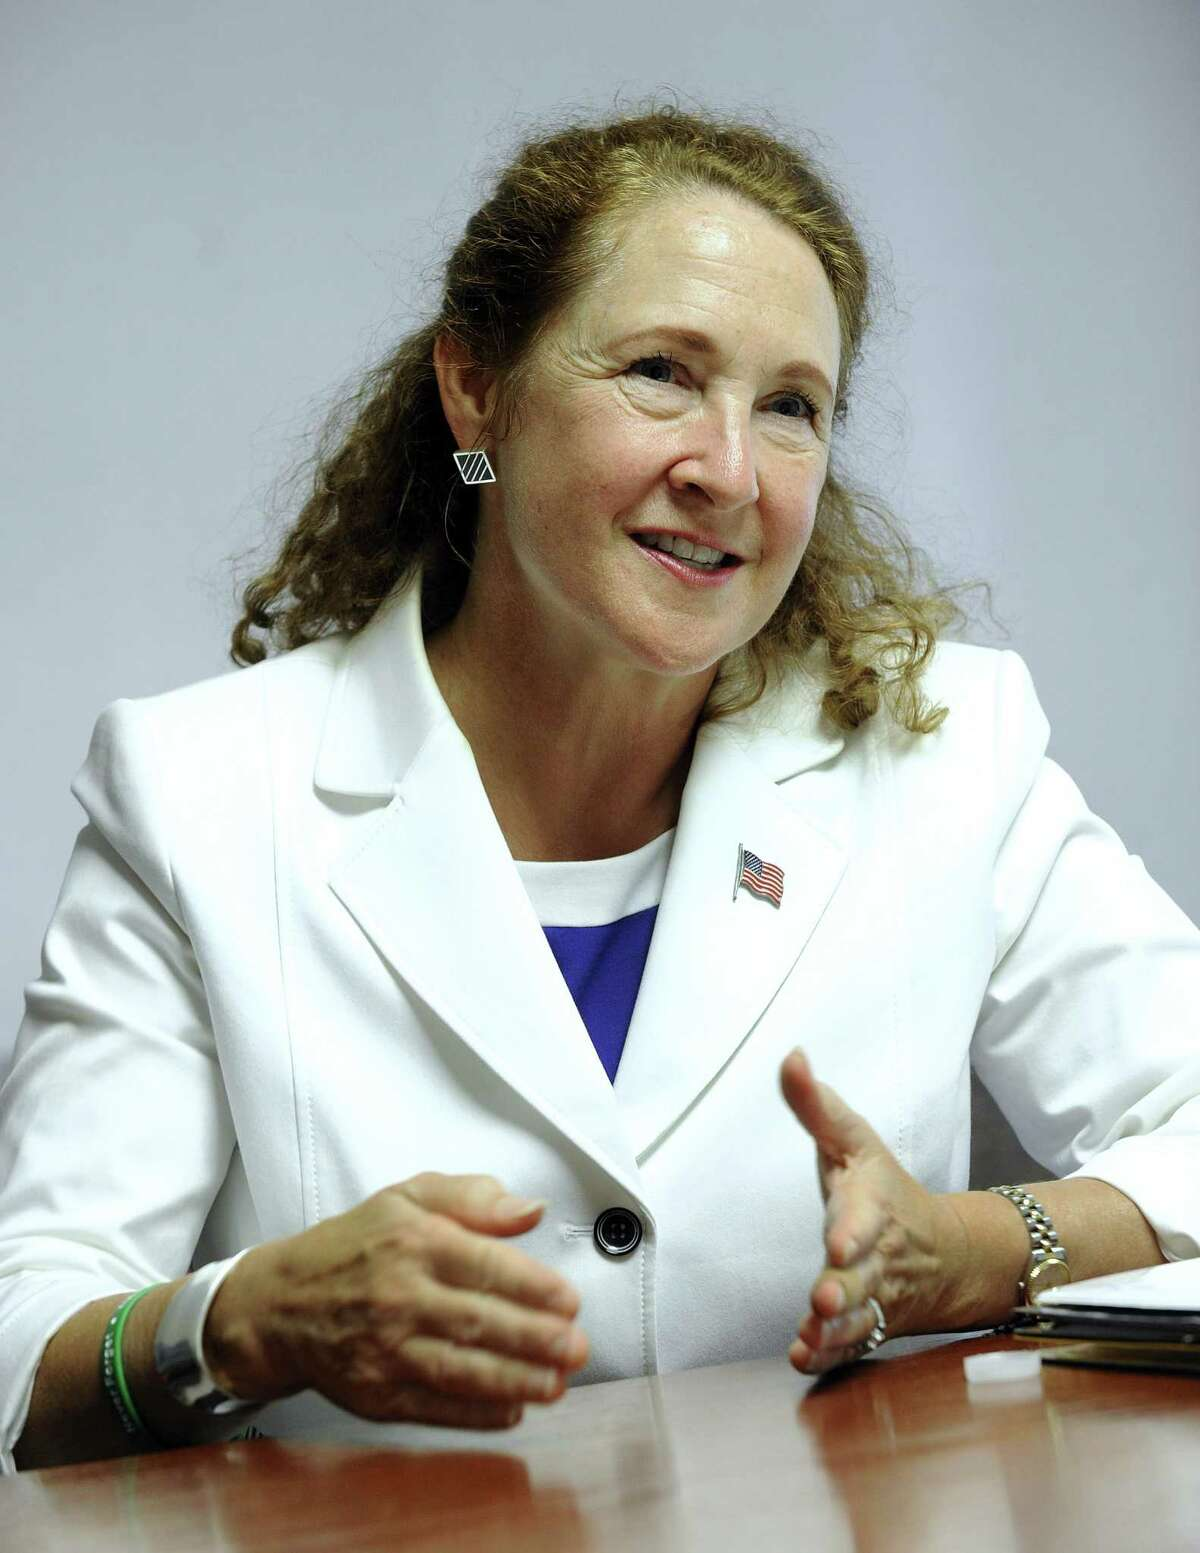 U.S. Rep. Elizabeth Esty Net worth: $3.3M Source: Wealth of Congress